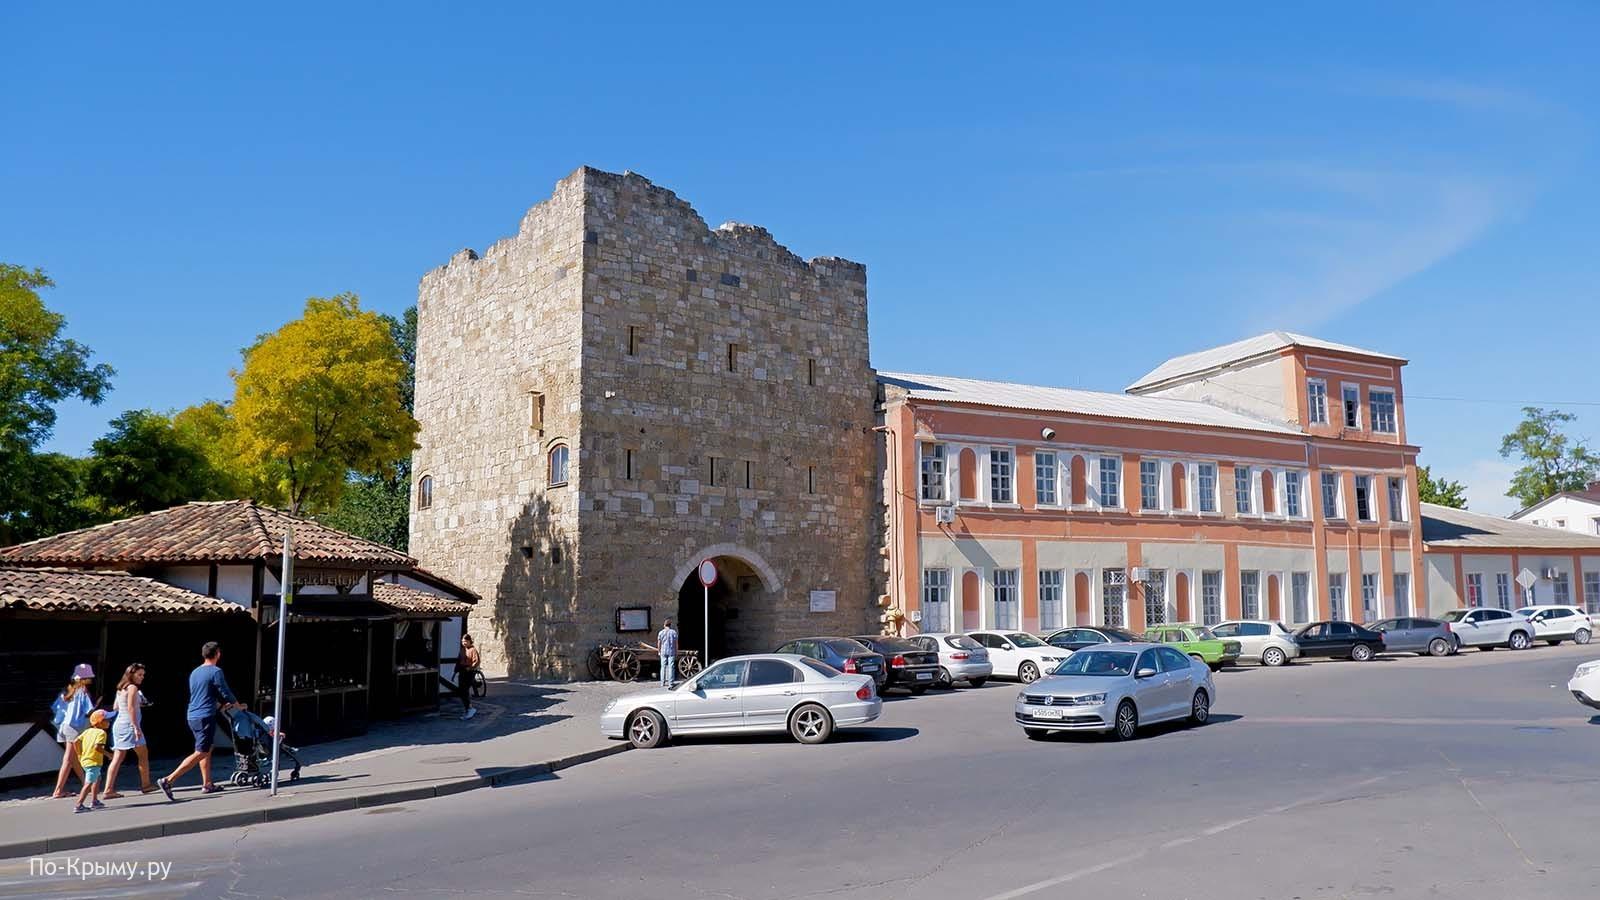 Гезлевские ворота - Одун-базар къапусы